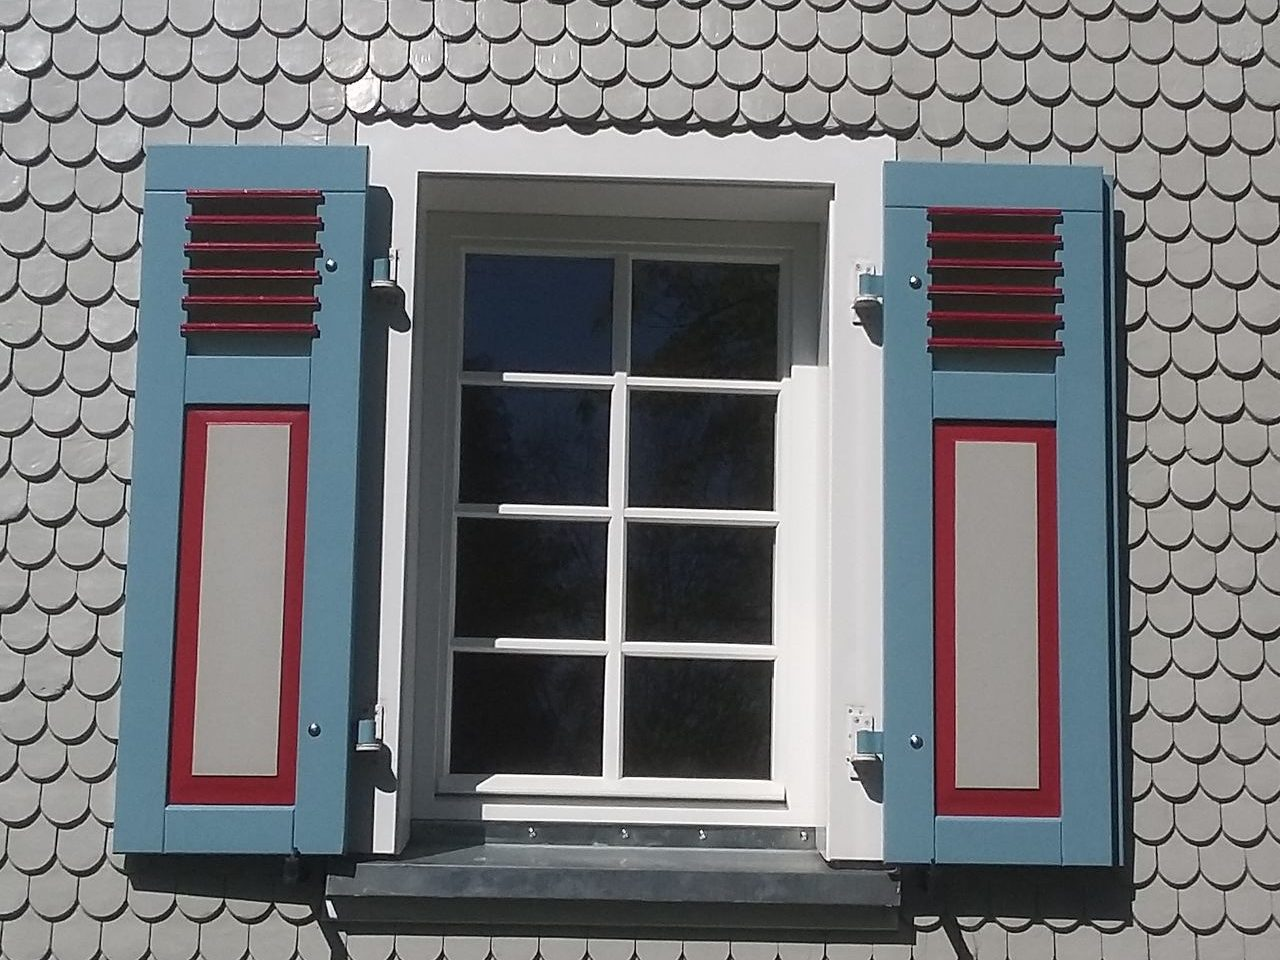 Holzklappladen in blau, rot u. weiss